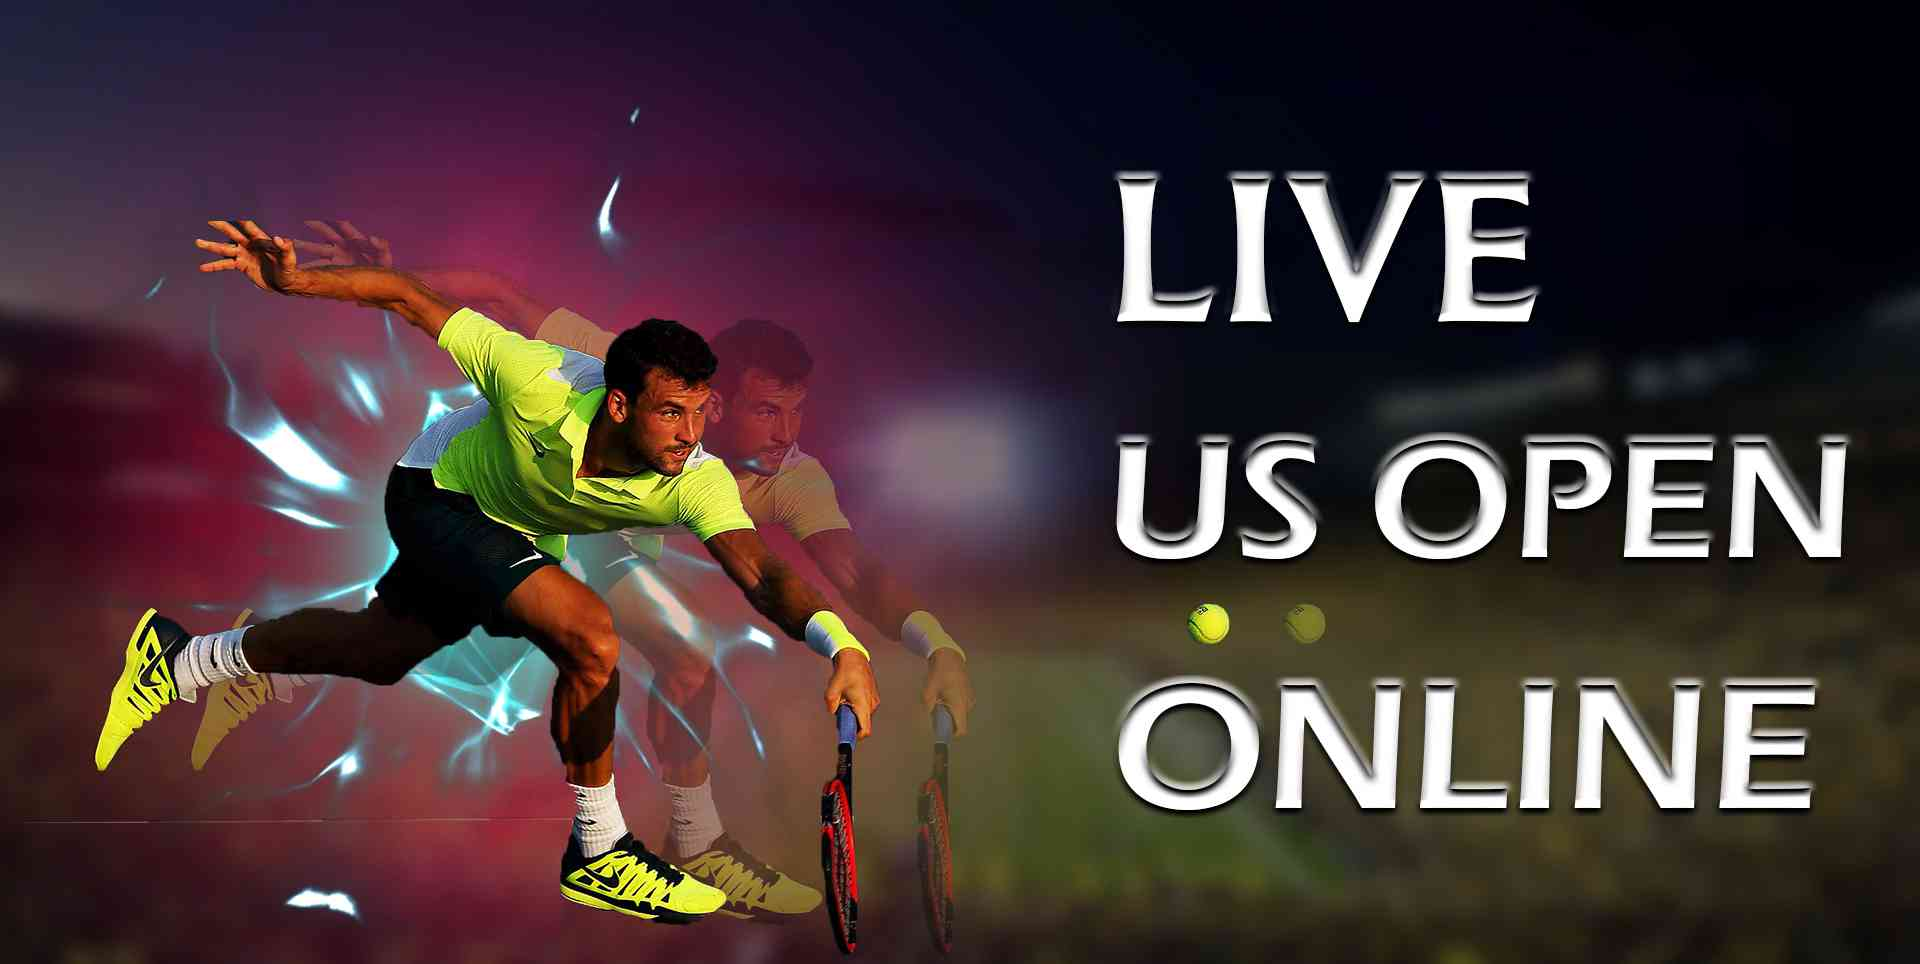 Live US Open Tennis 2018 Online slider